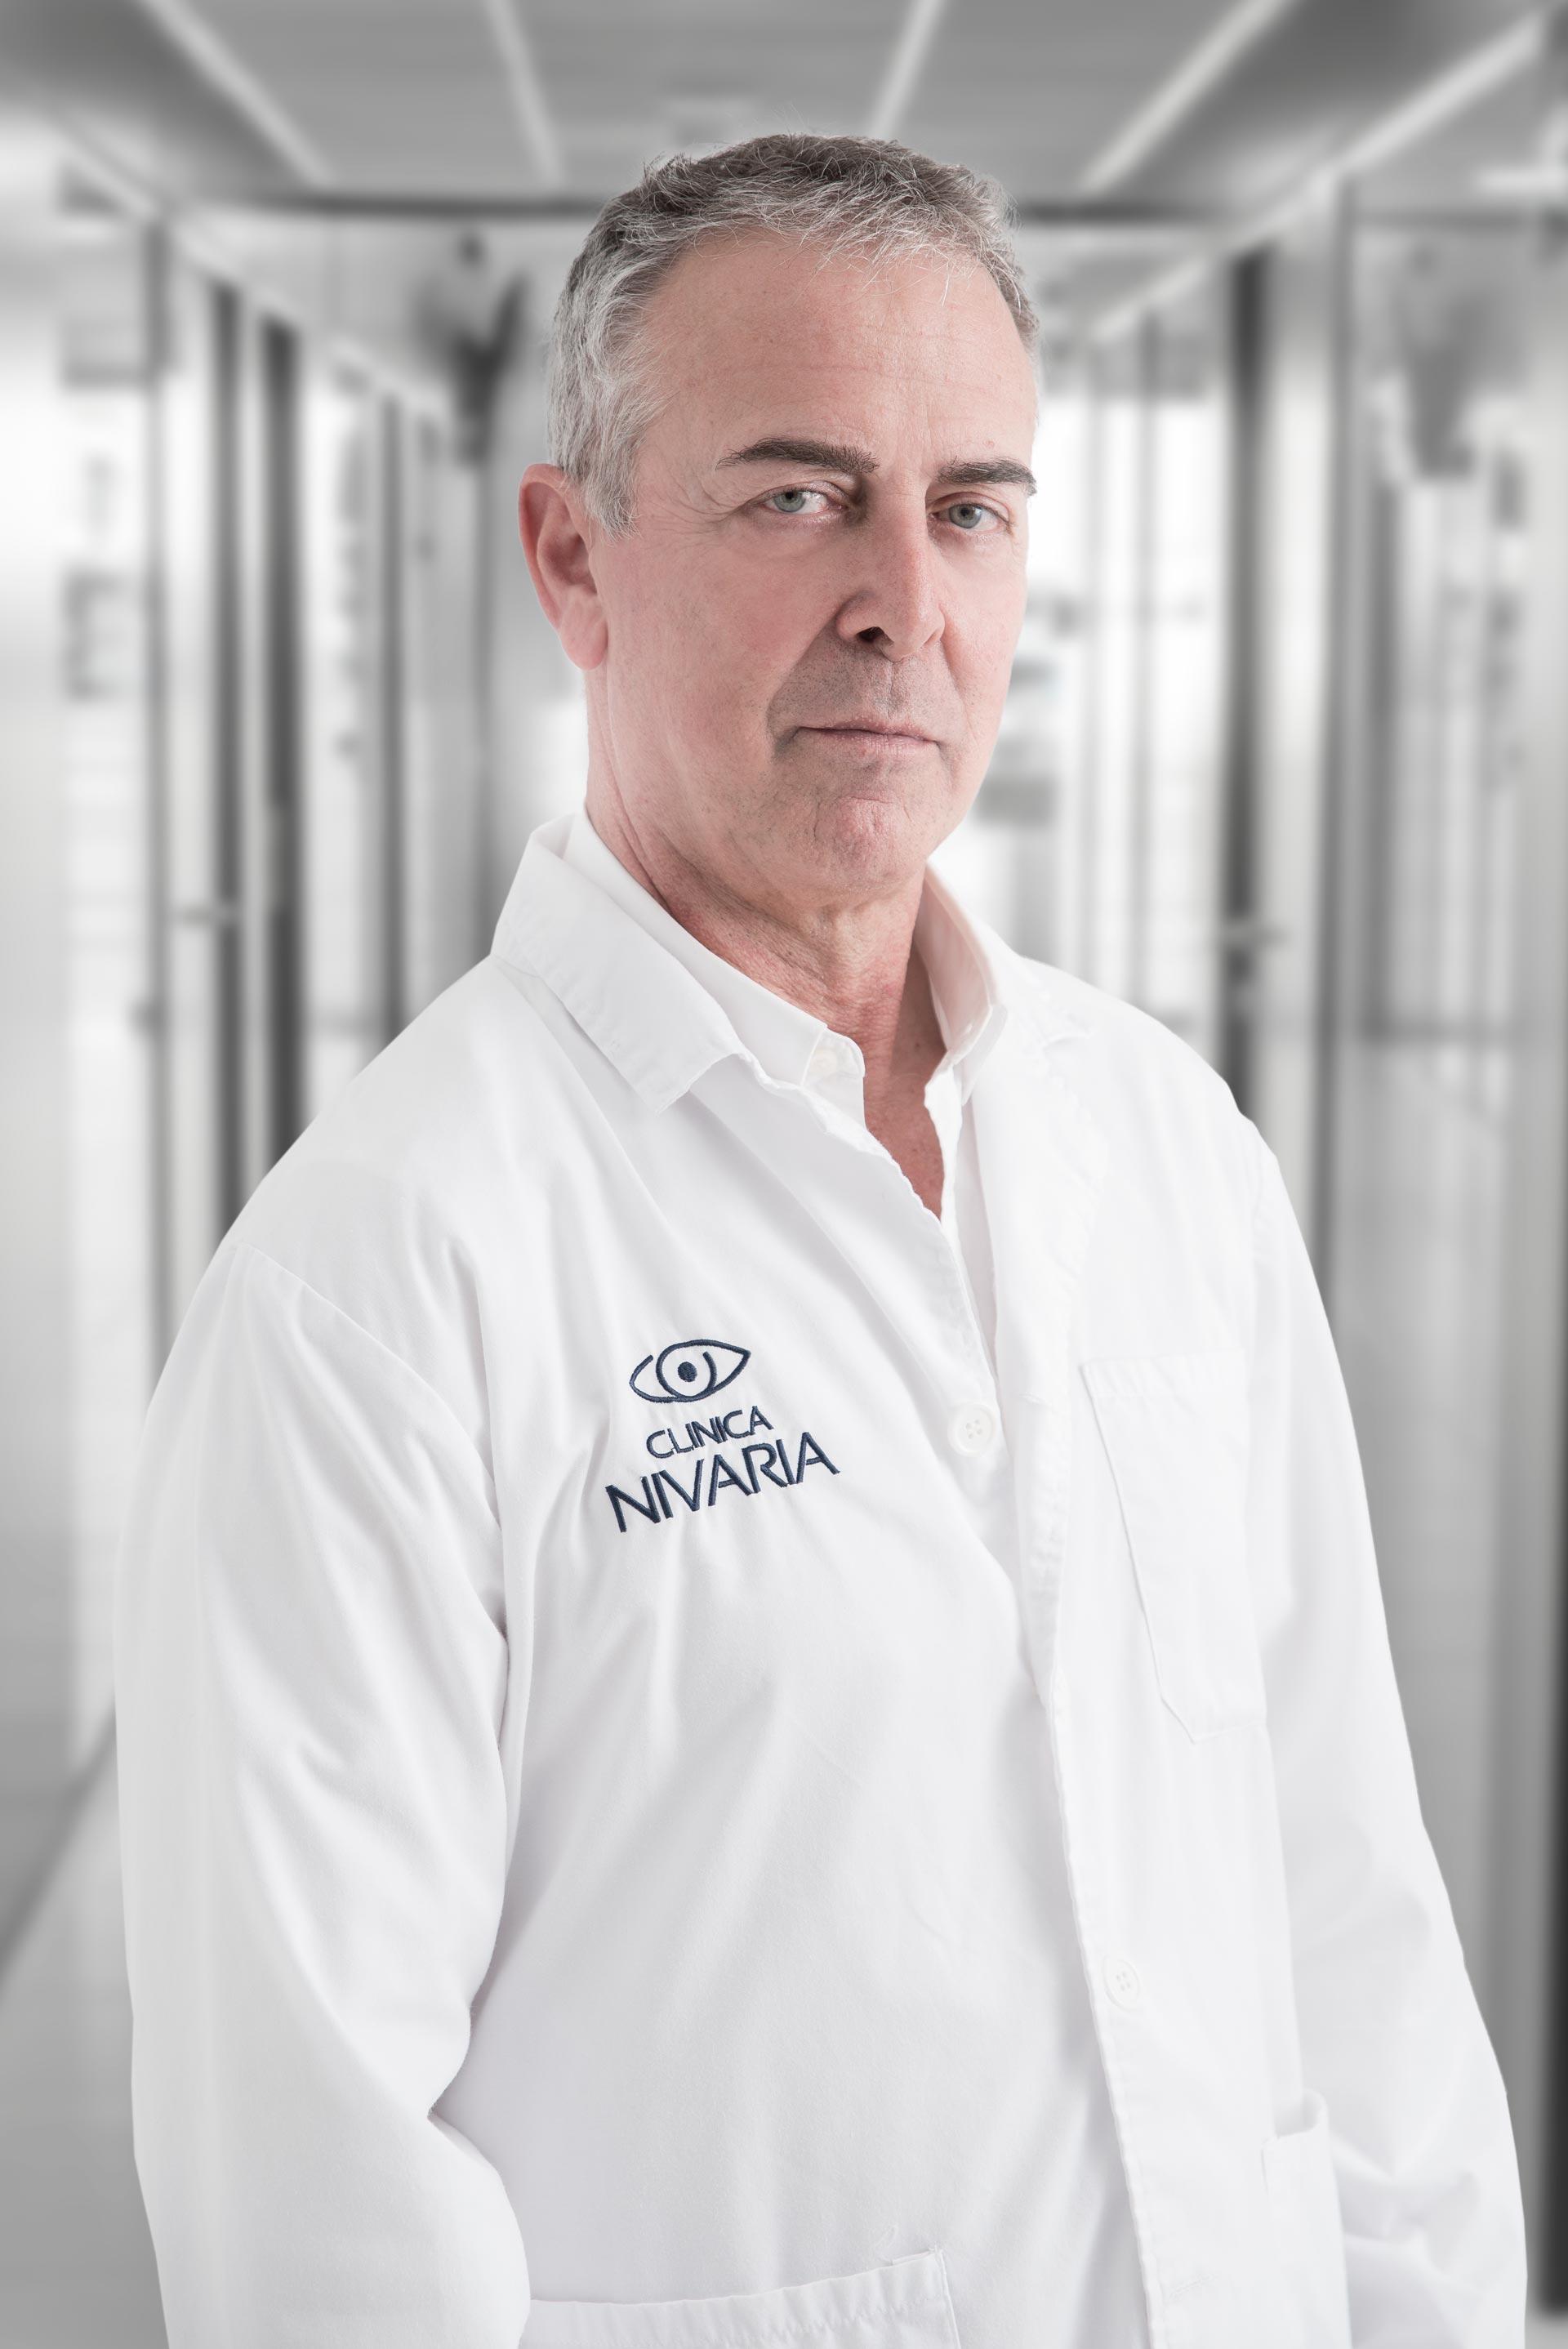 Dr. Luis Naharro